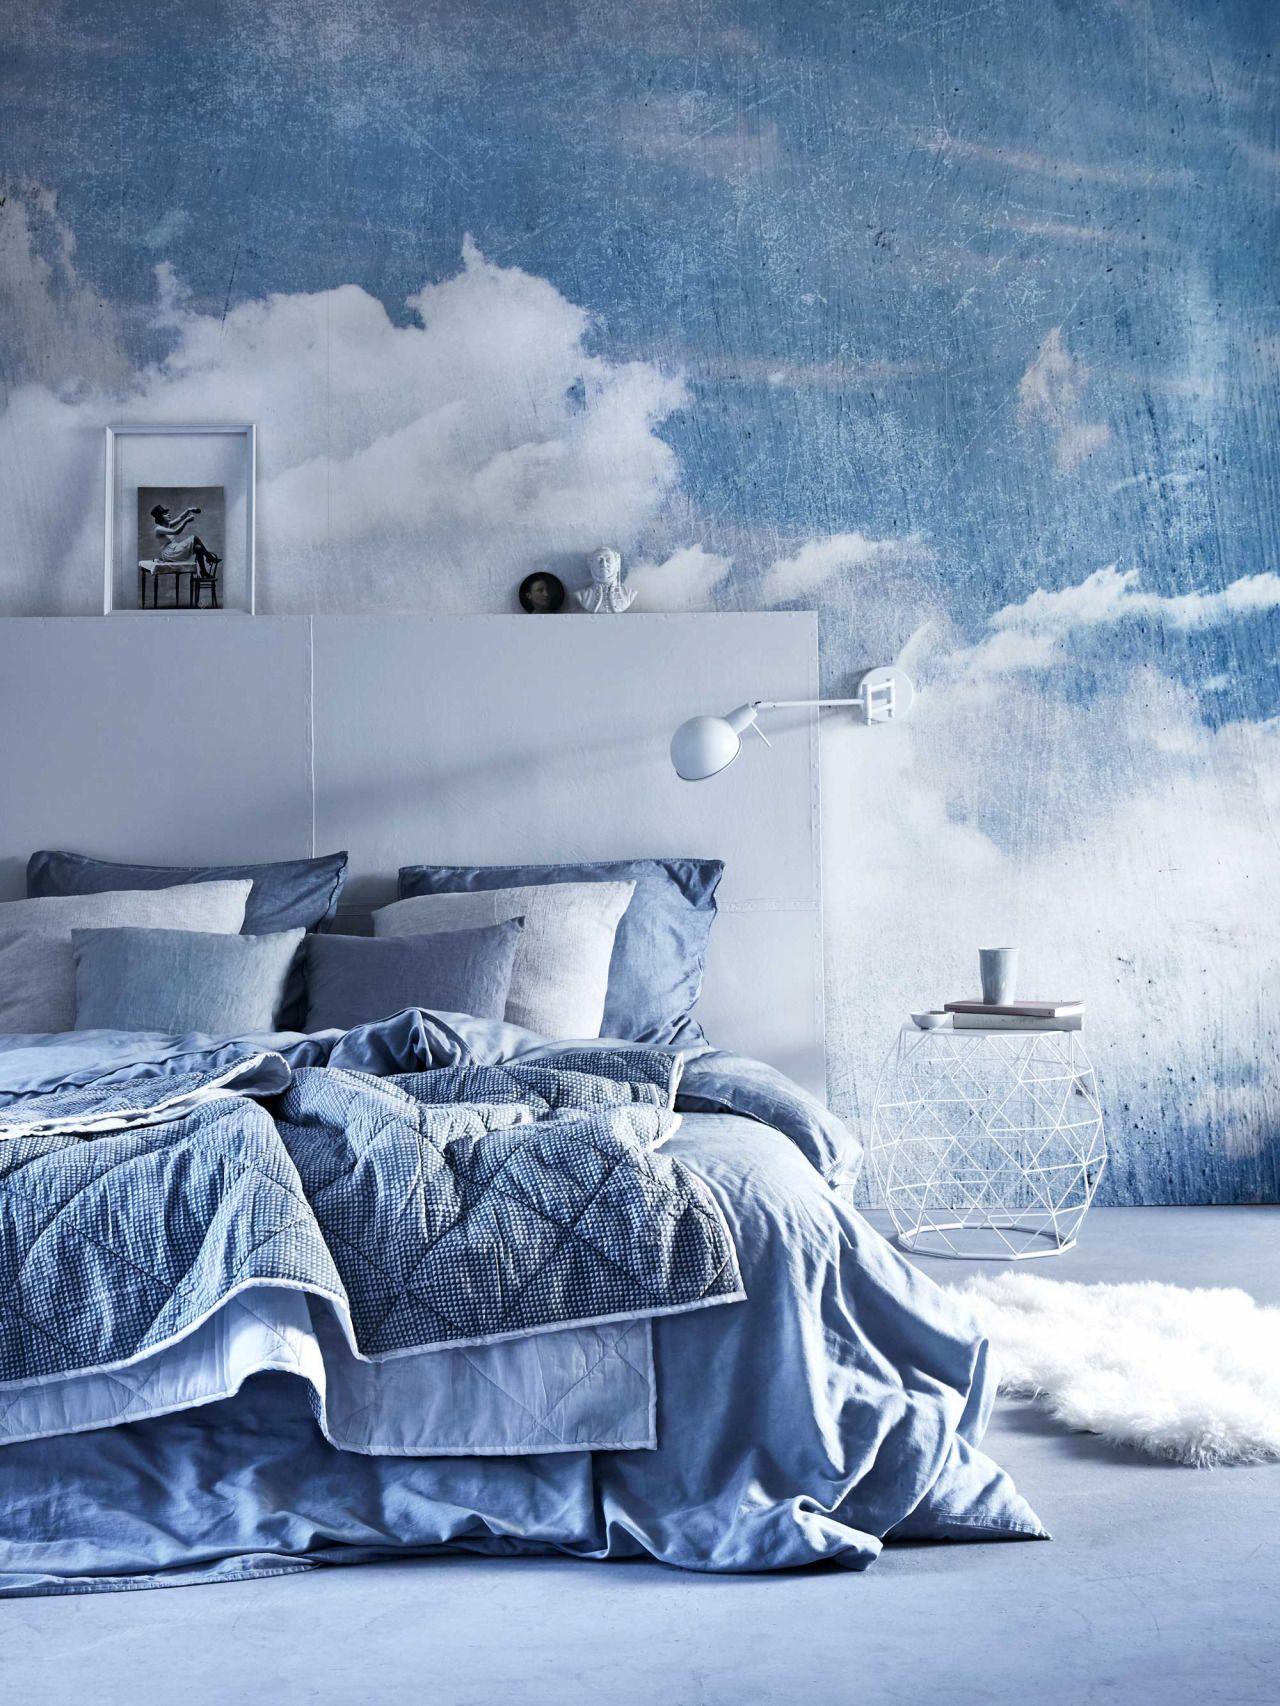 Blue Inspiration By Vt Wonen Gravityhomeblog Com Instagram